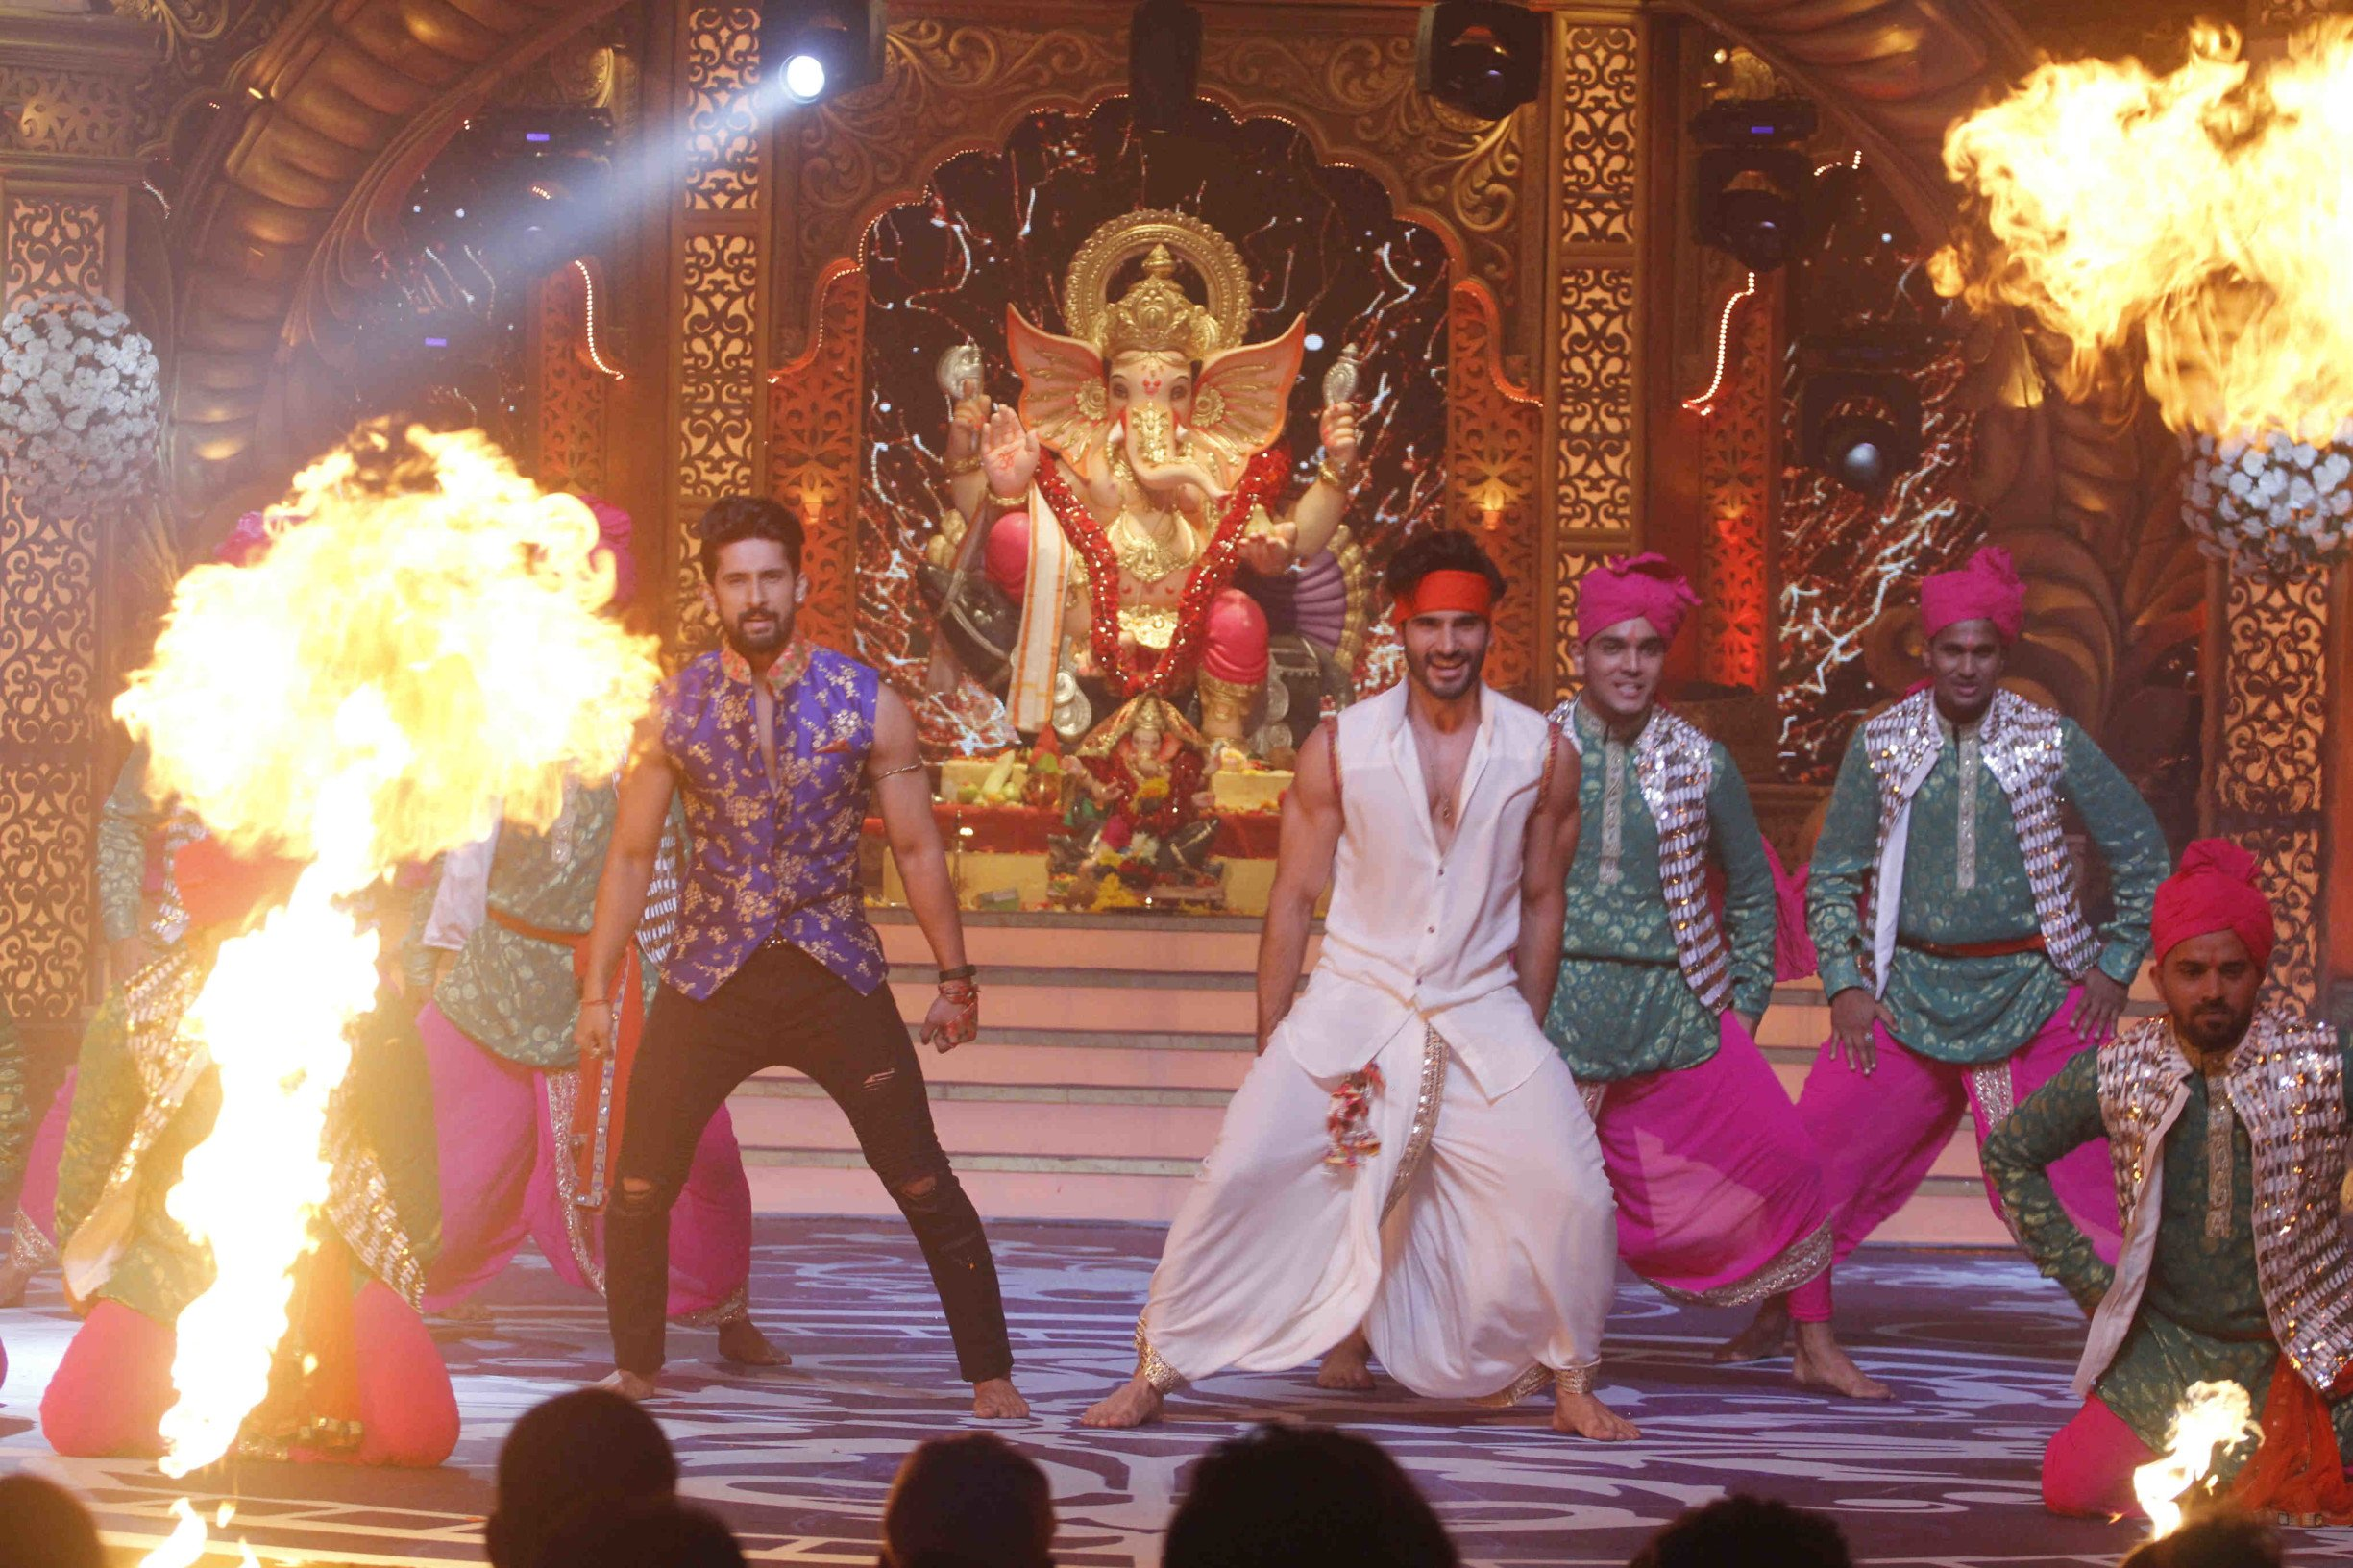 Zee TV's 'Kundali Bhagya' hosts a celebration to welcome Bappa